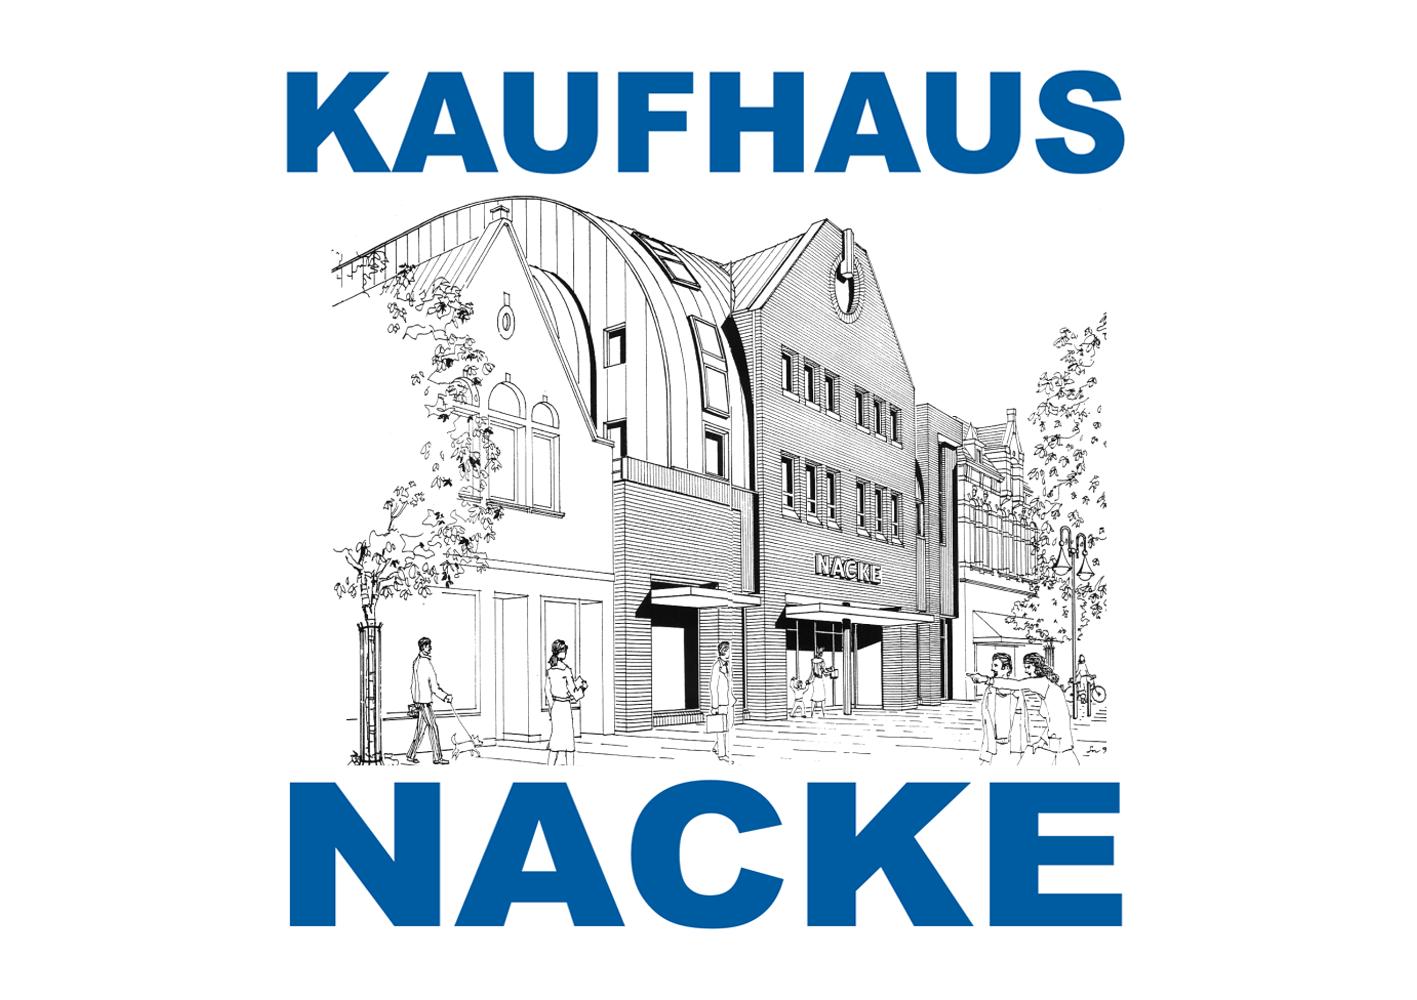 Kaufhaus Nacke